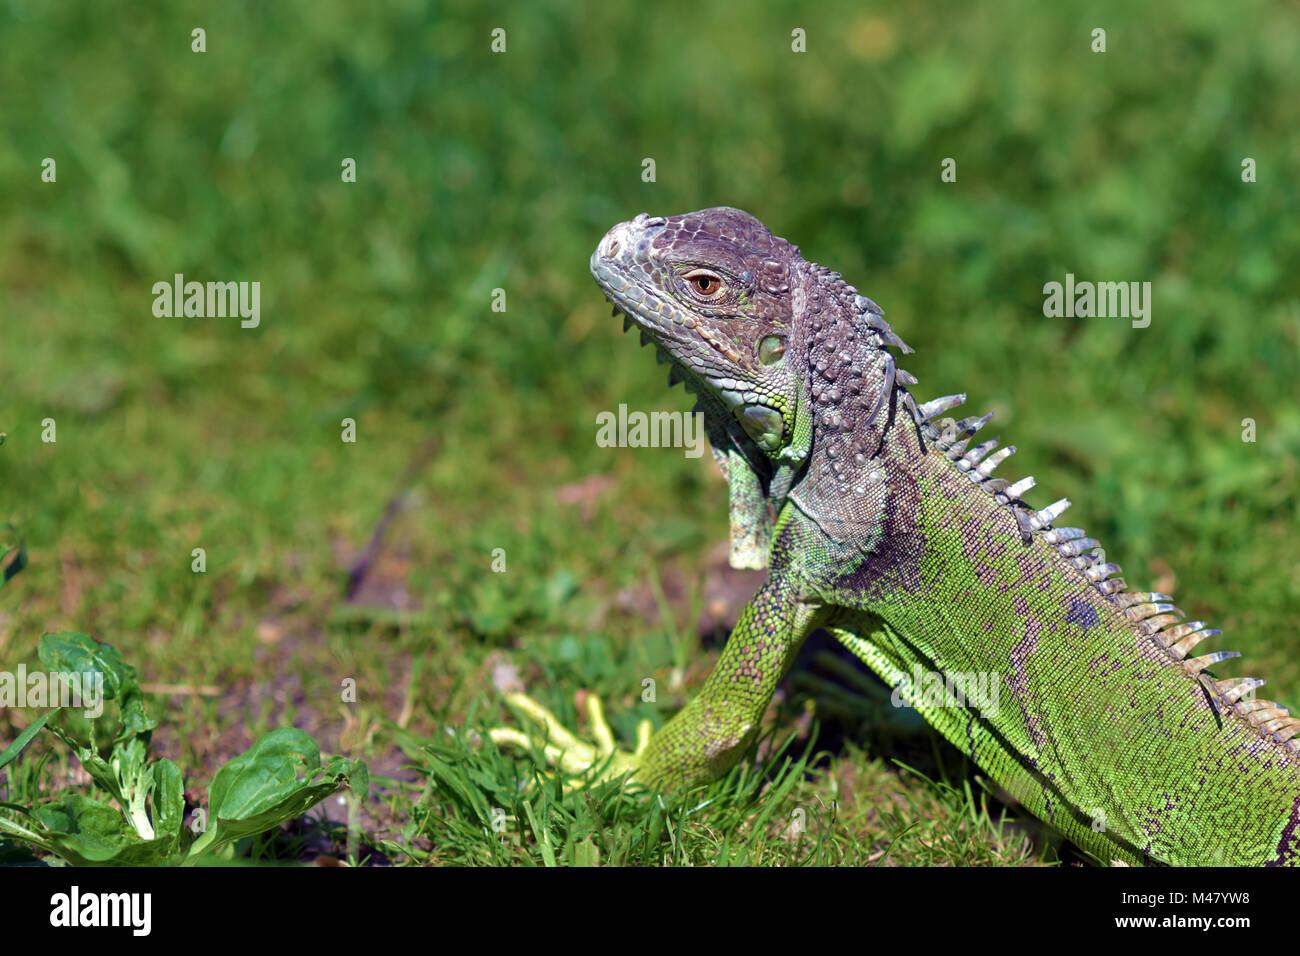 Green iguana - large herbivorous lizard close up - Stock Image